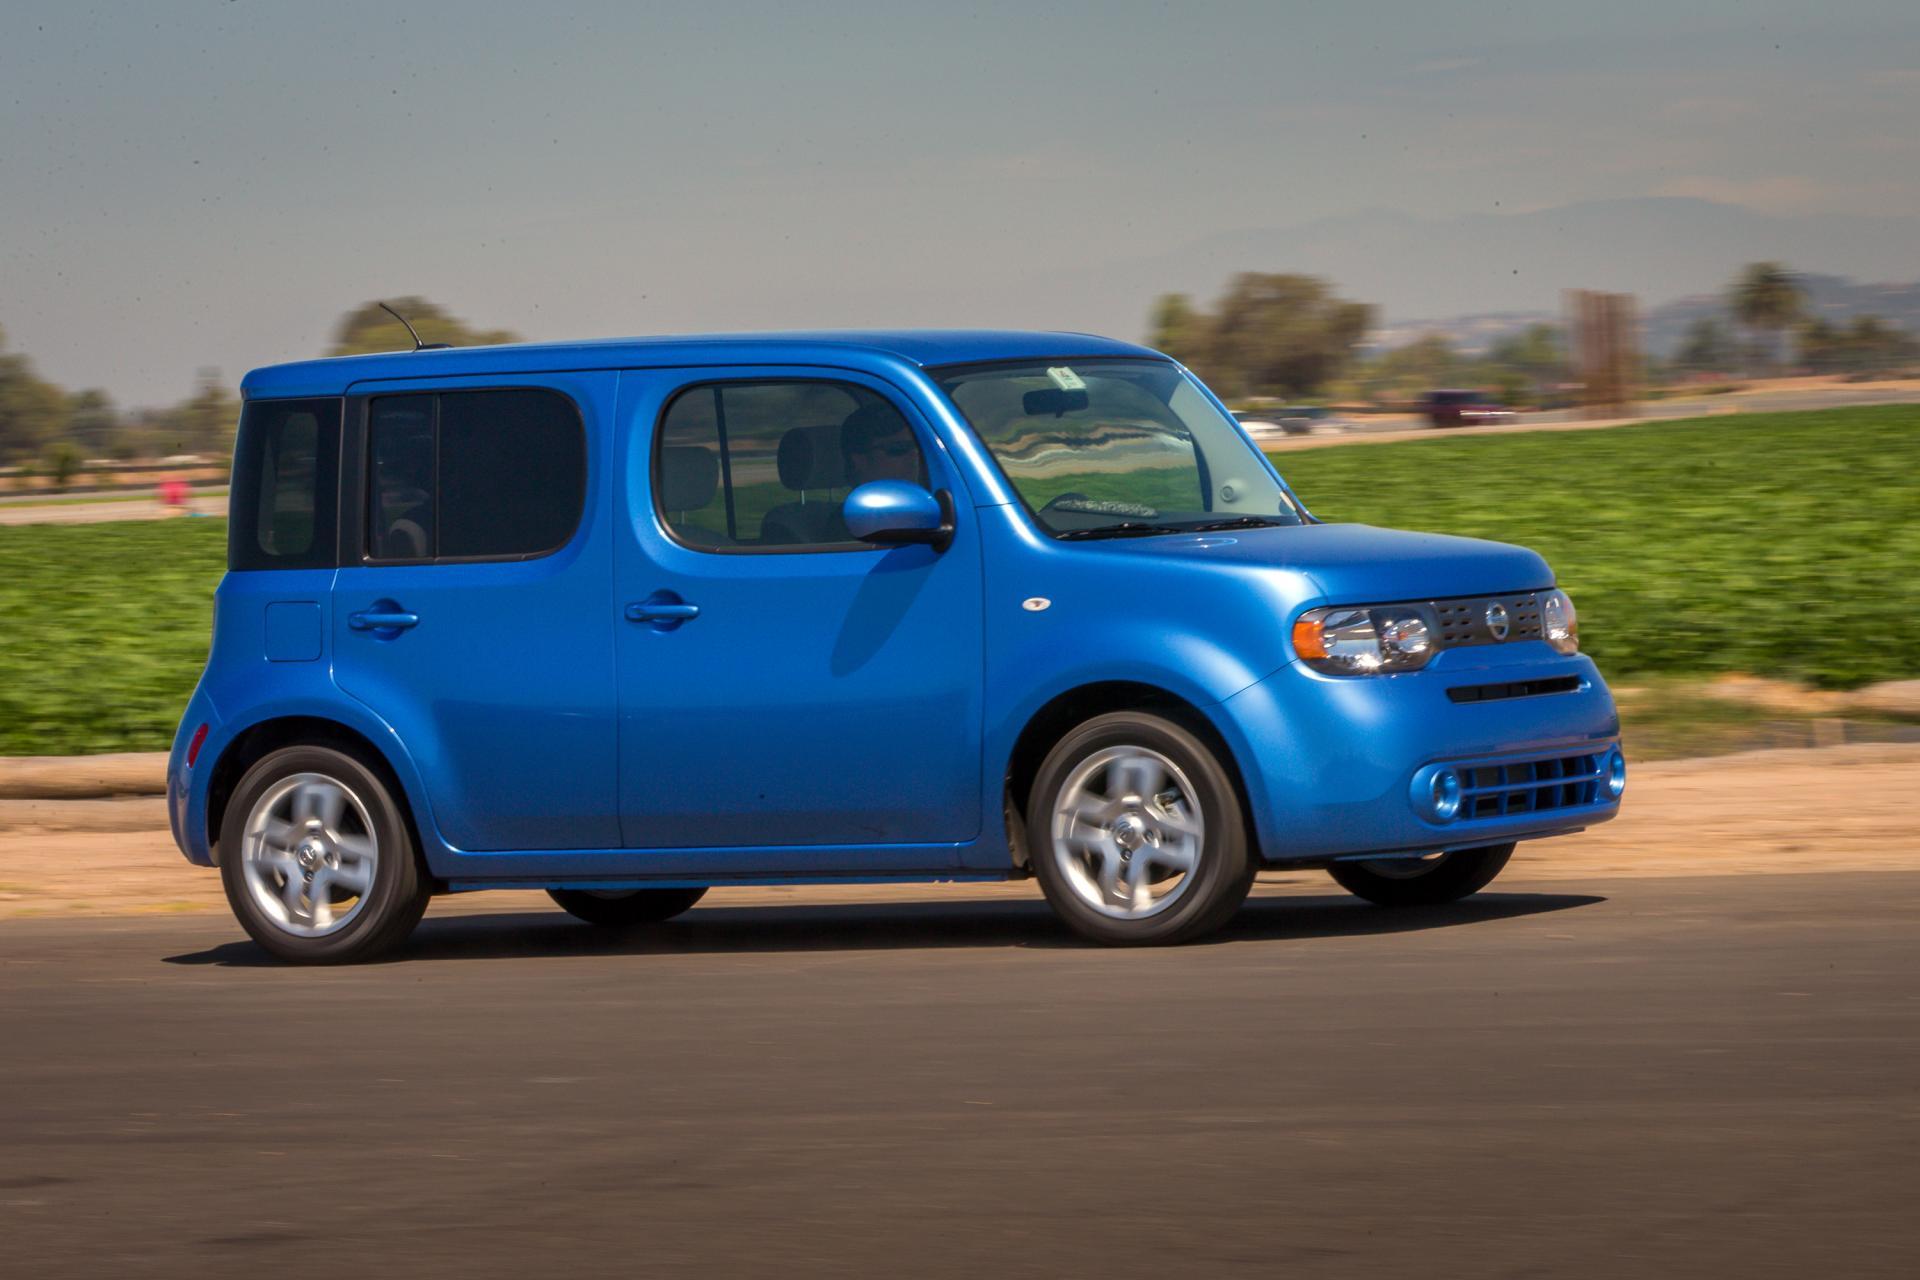 2014 Nissan Cube News and Information | conceptcarz.com